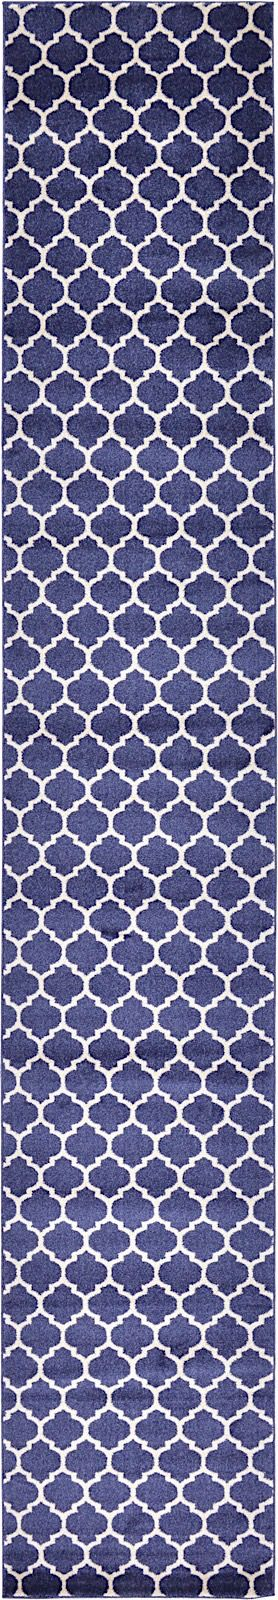 theodora contemporary area rug collection